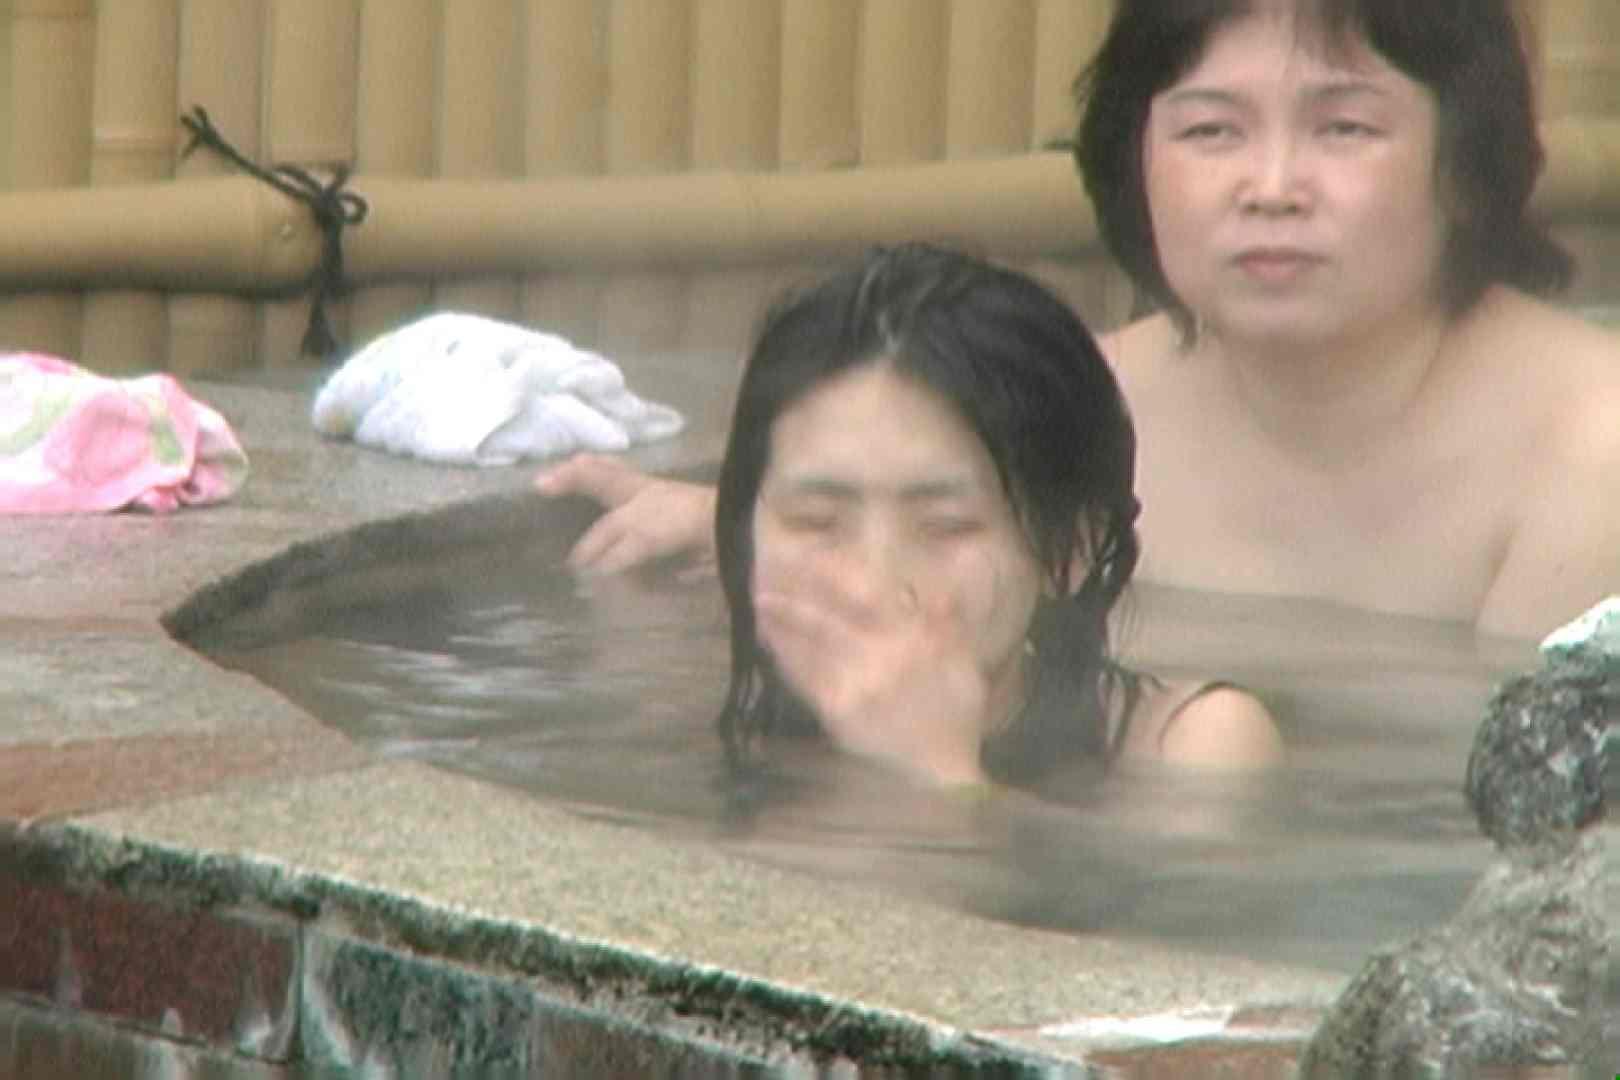 Aquaな露天風呂Vol.646 HなOL | 盗撮  89pic 31